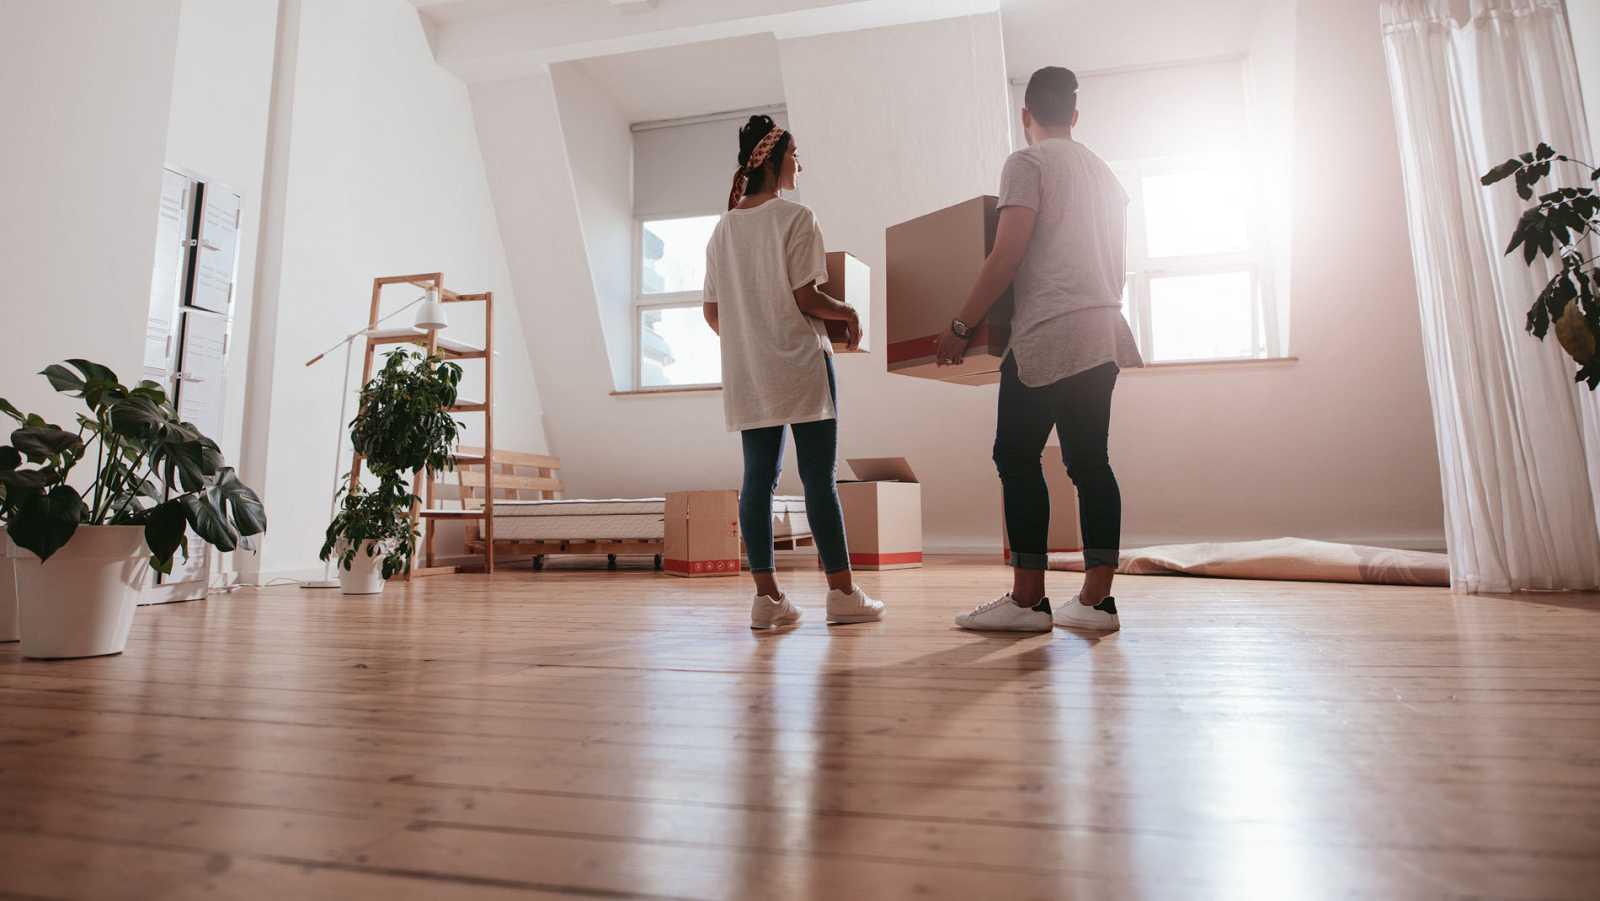 Una pareja joven realiza la mudanza a un nuevo piso